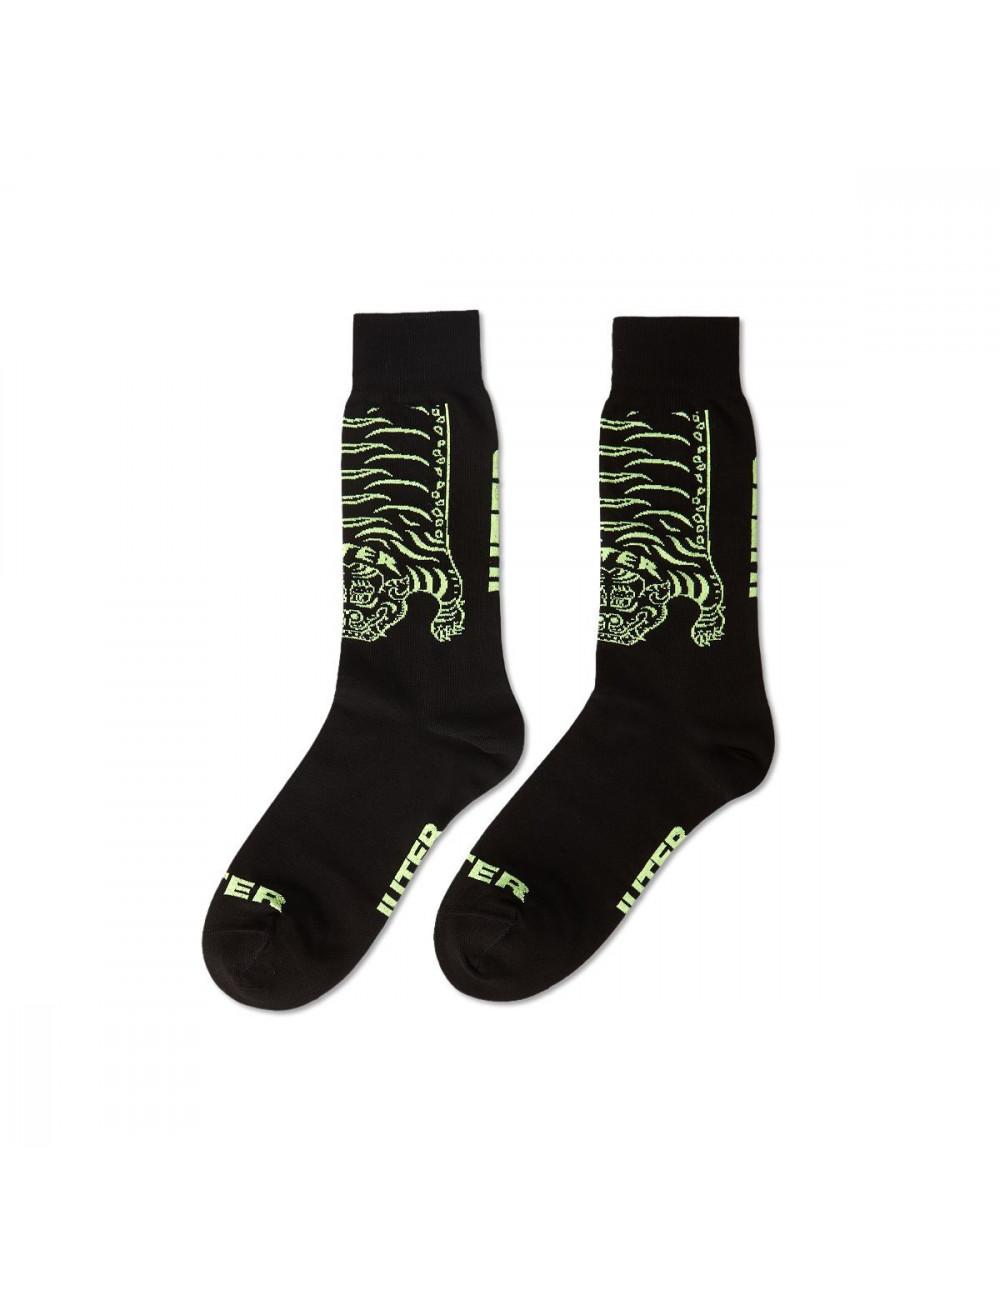 Iuter Tibetan socks - 19WISXP05   Shapestore.it